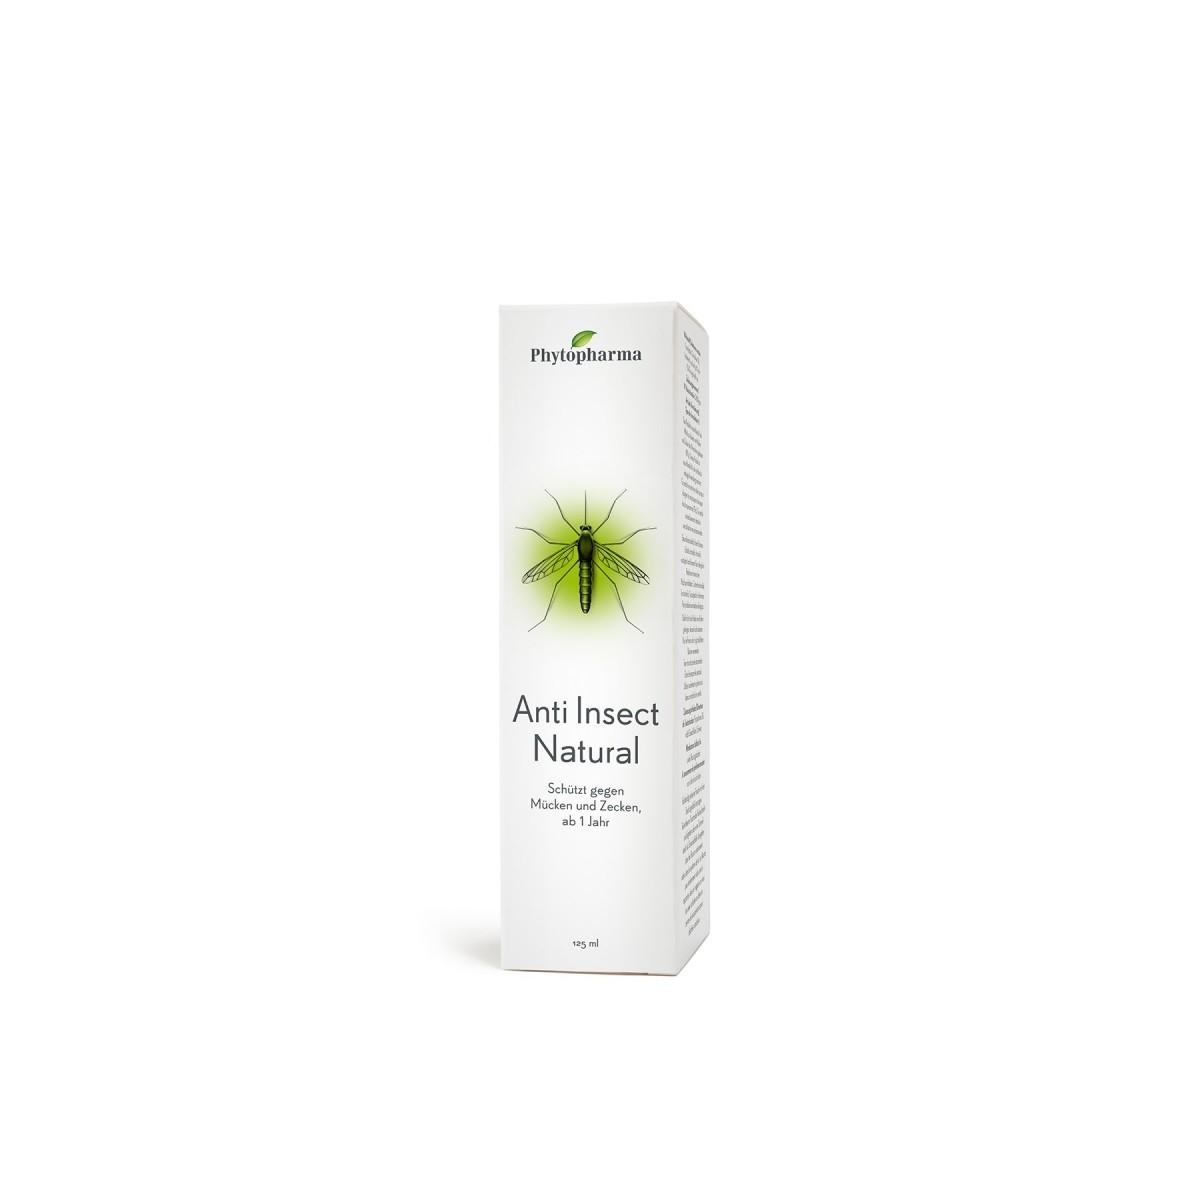 Phytopharma Anti Insect Natural Spray 125ml